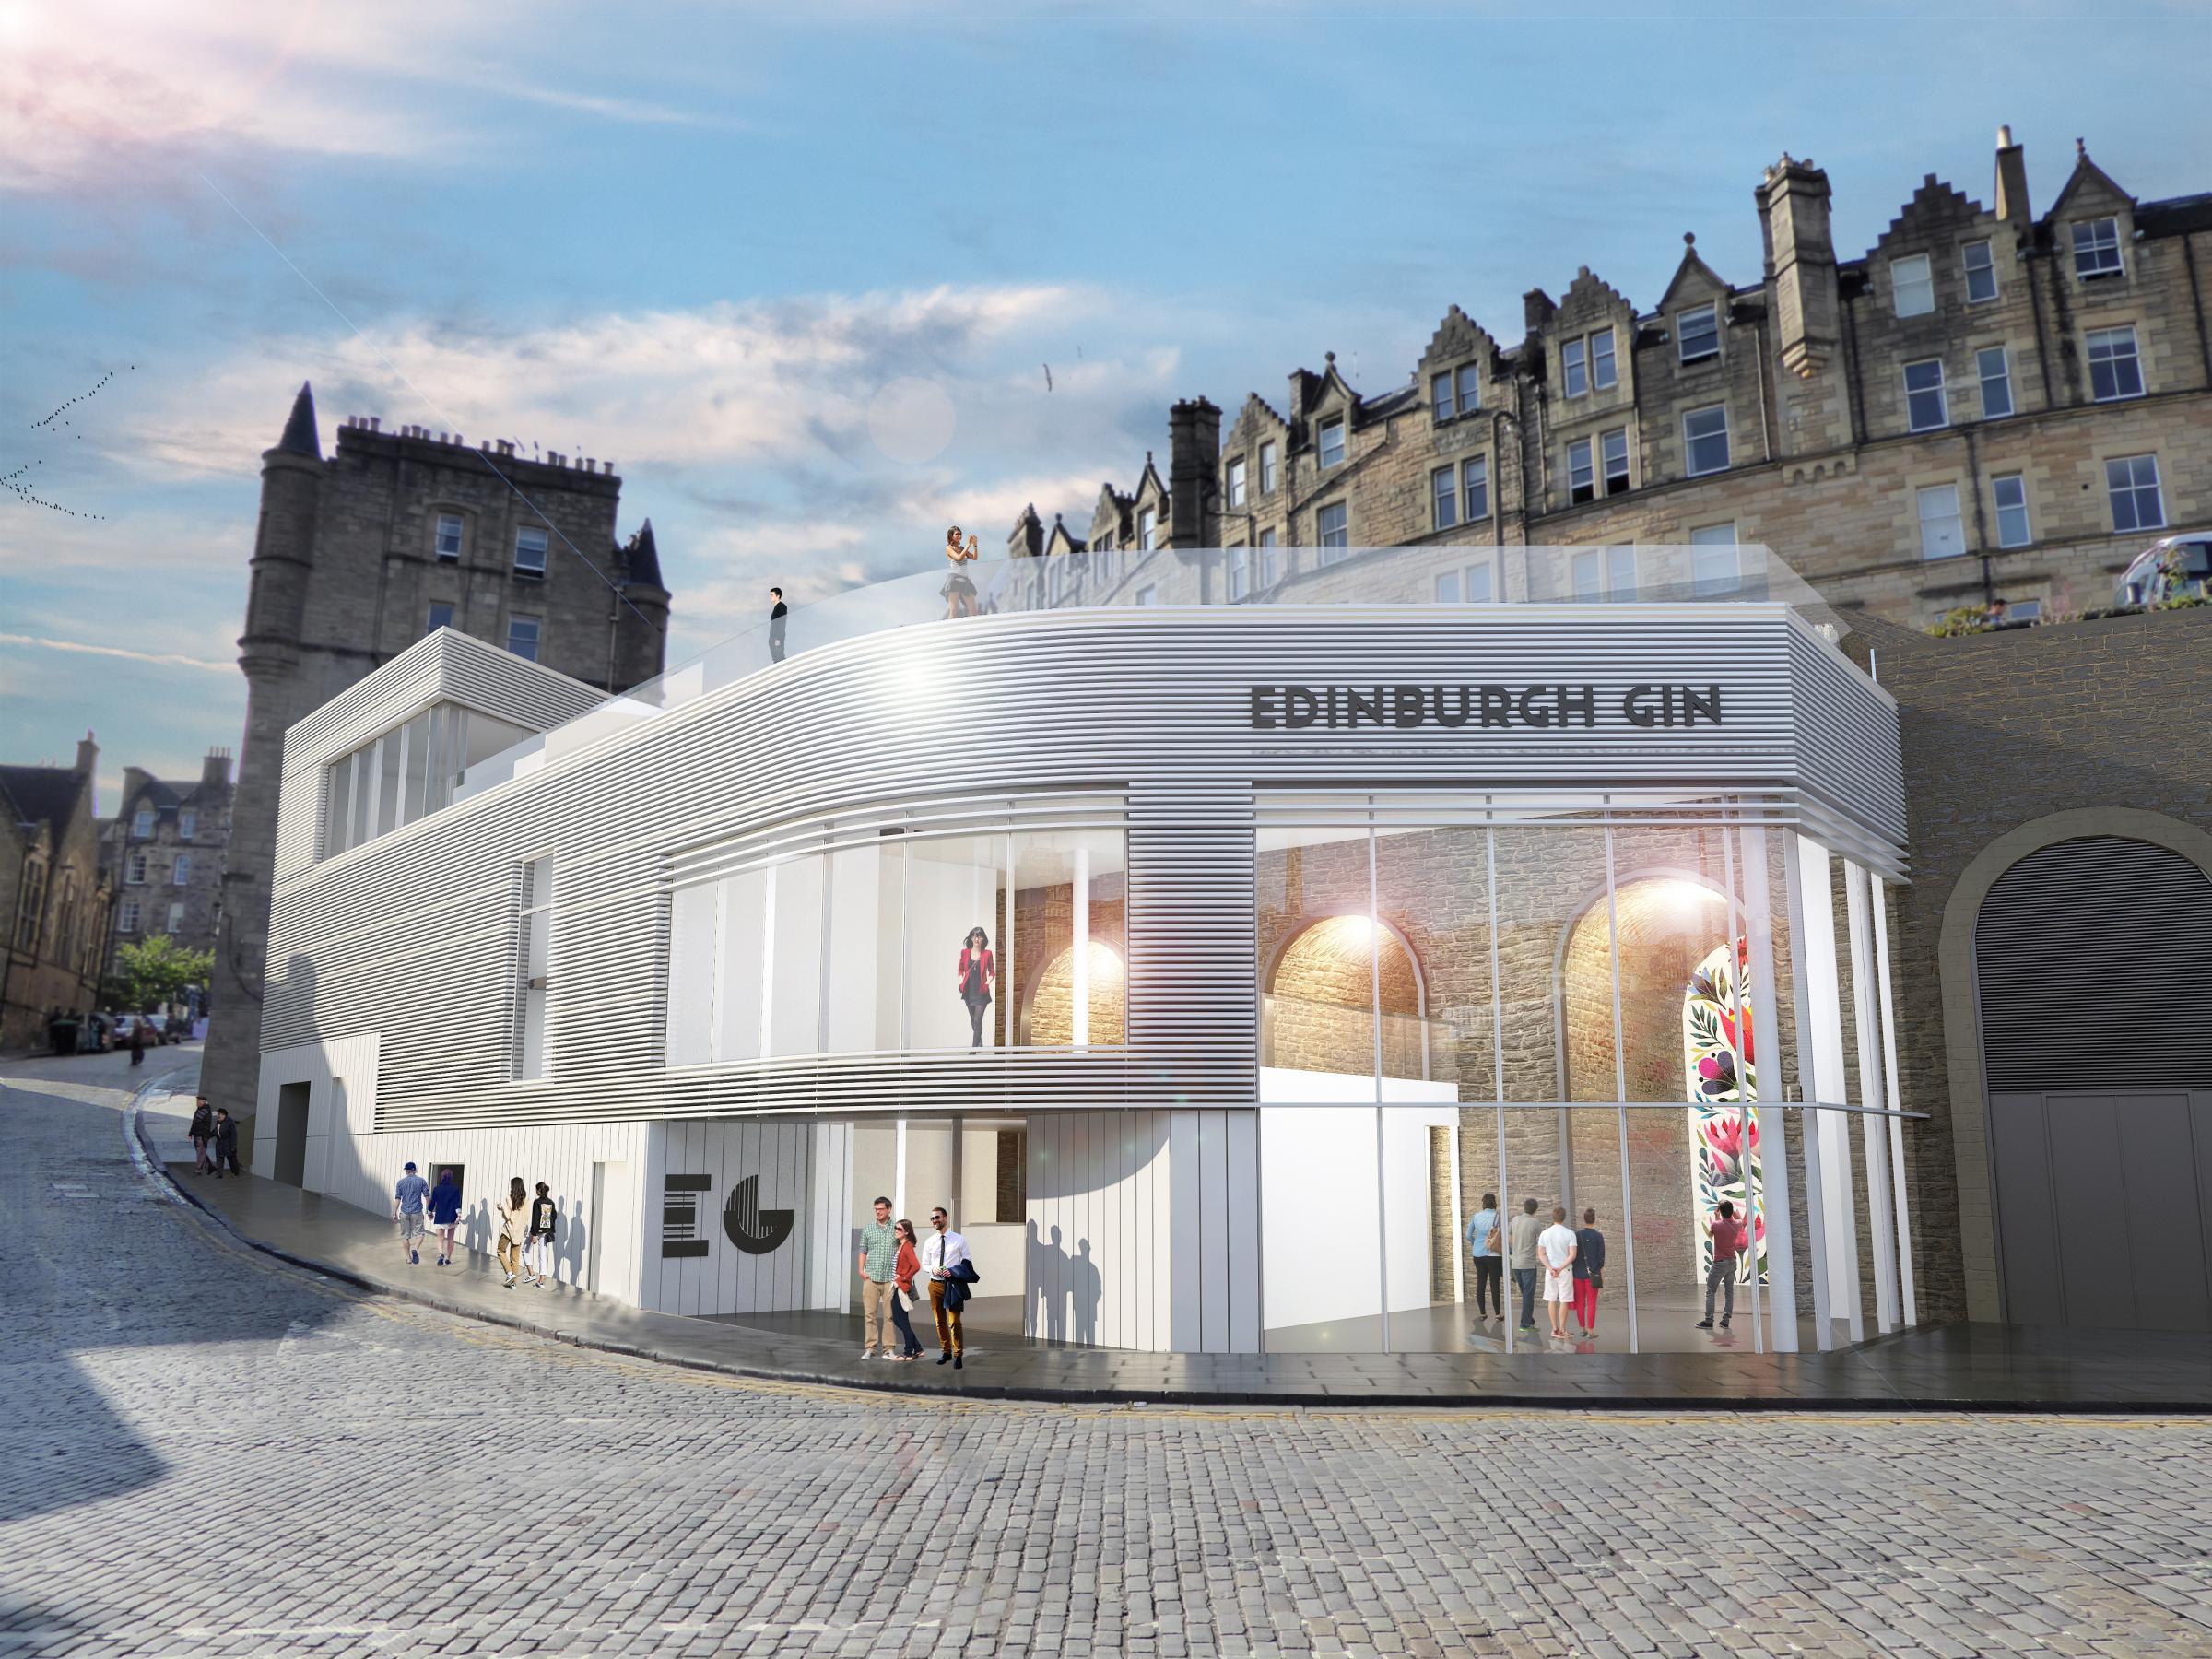 Gin distillery planned for Edinburgh city centre